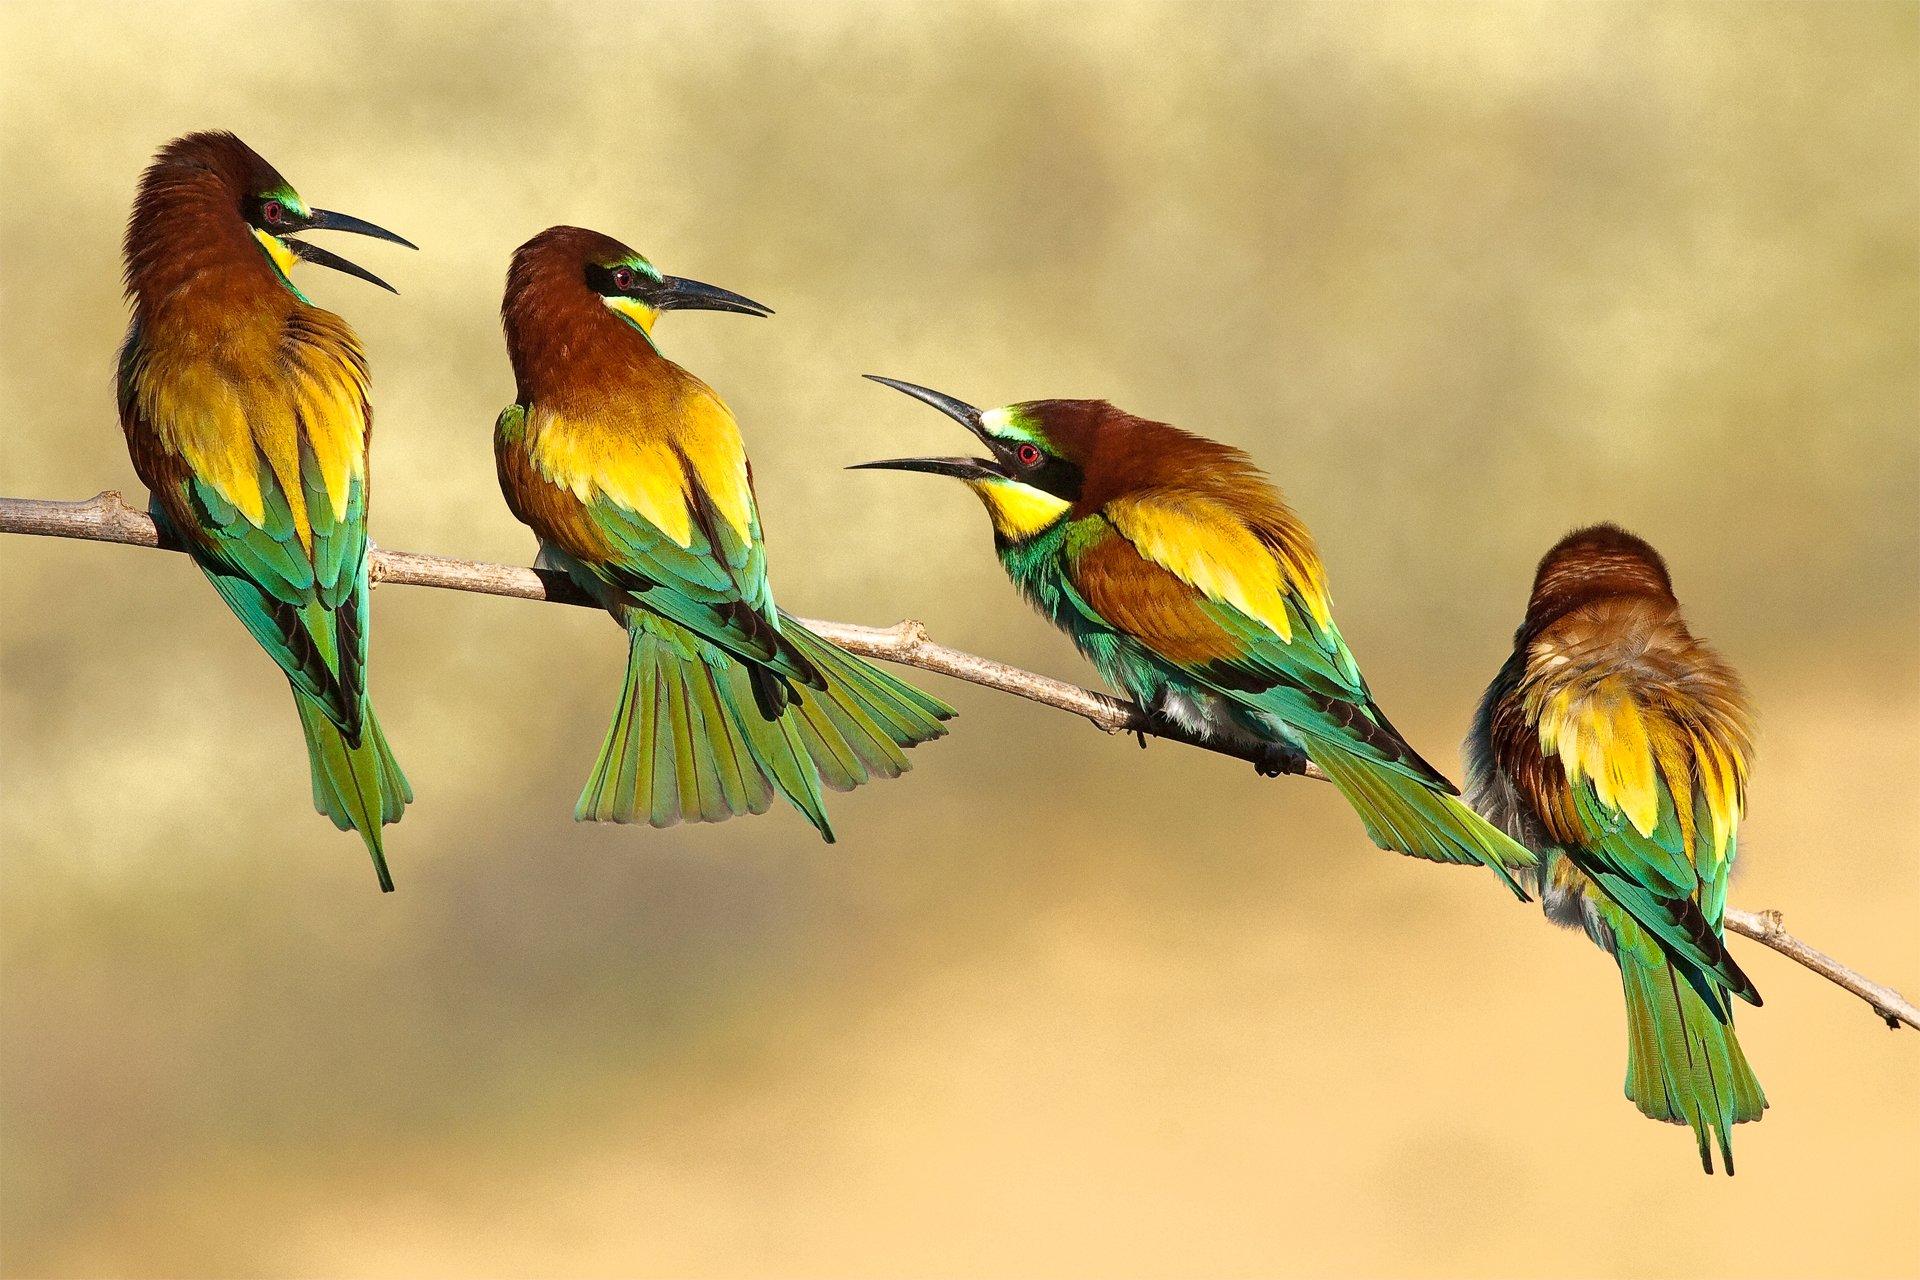 с птицами картинки про можно найти